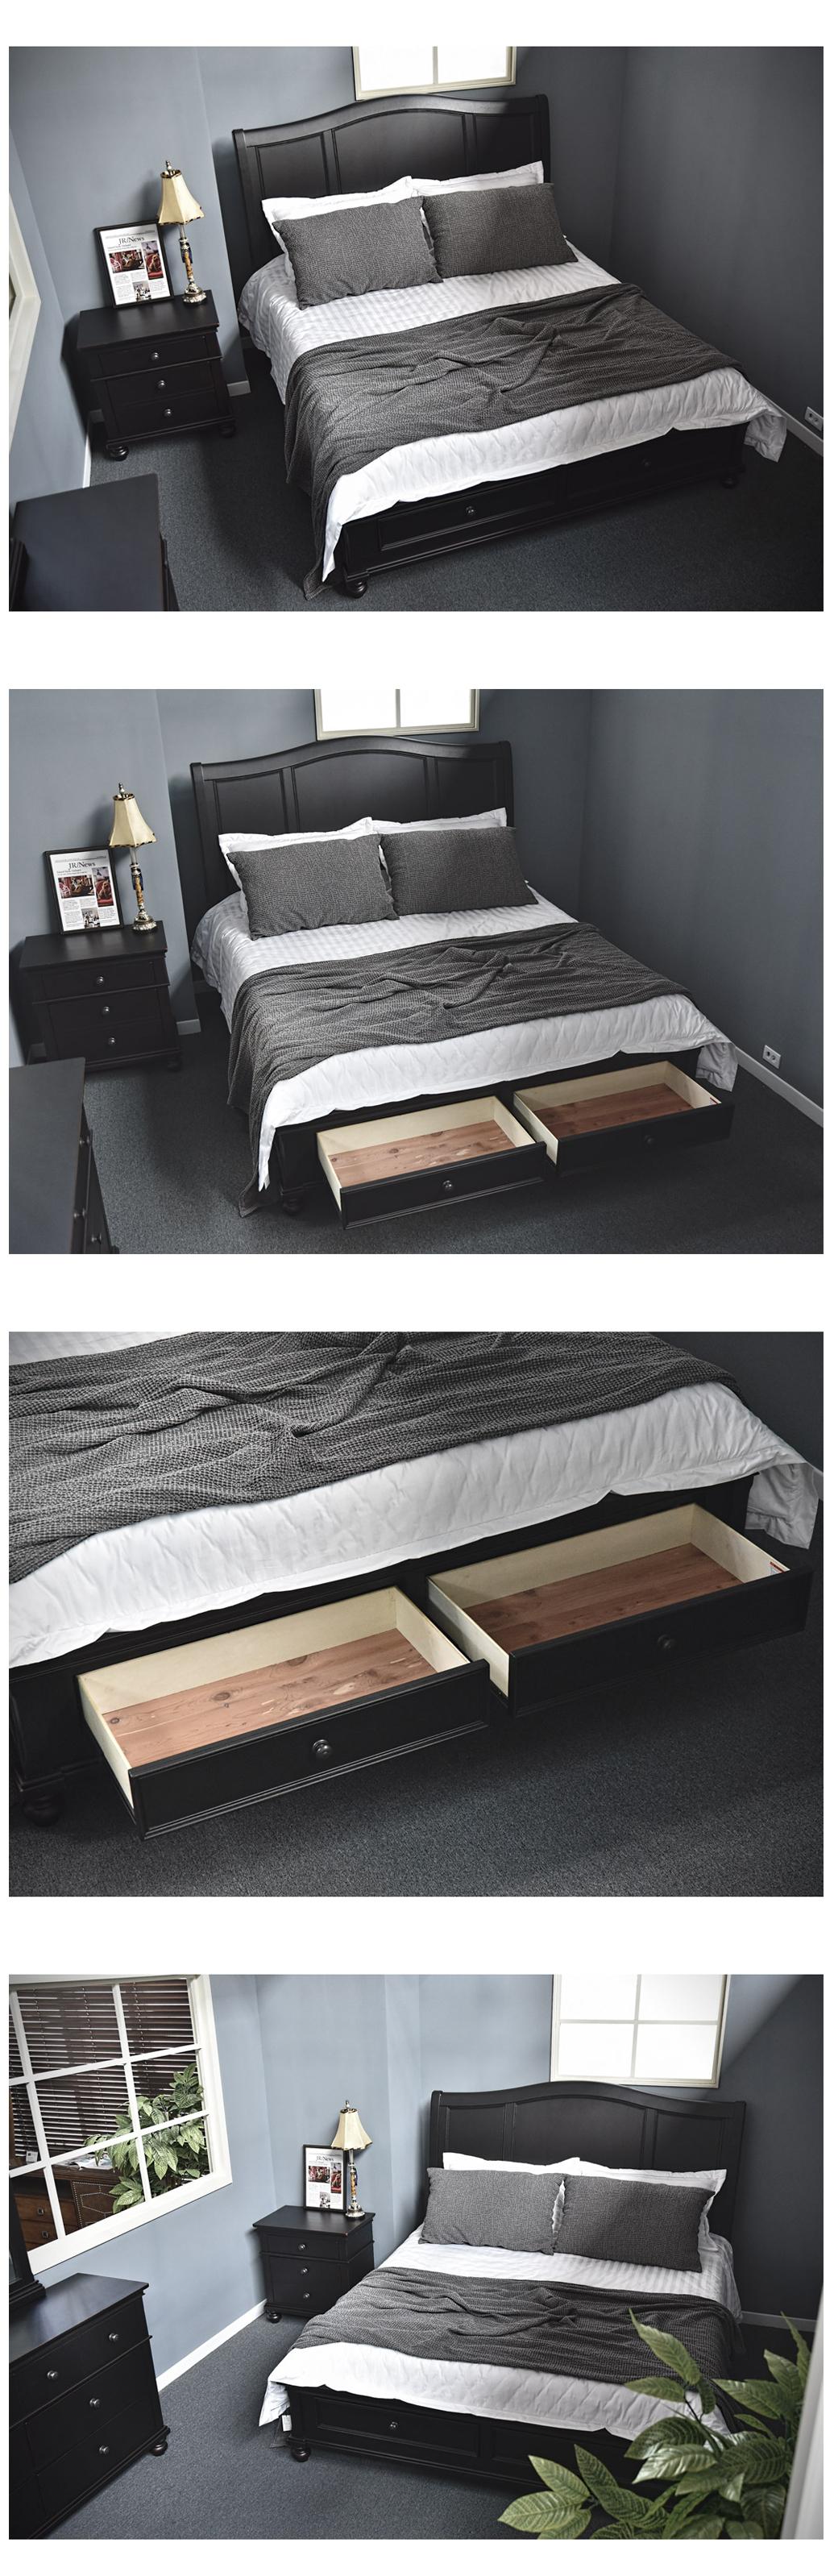 i07_qxford_storage_bed_black_02.jpg